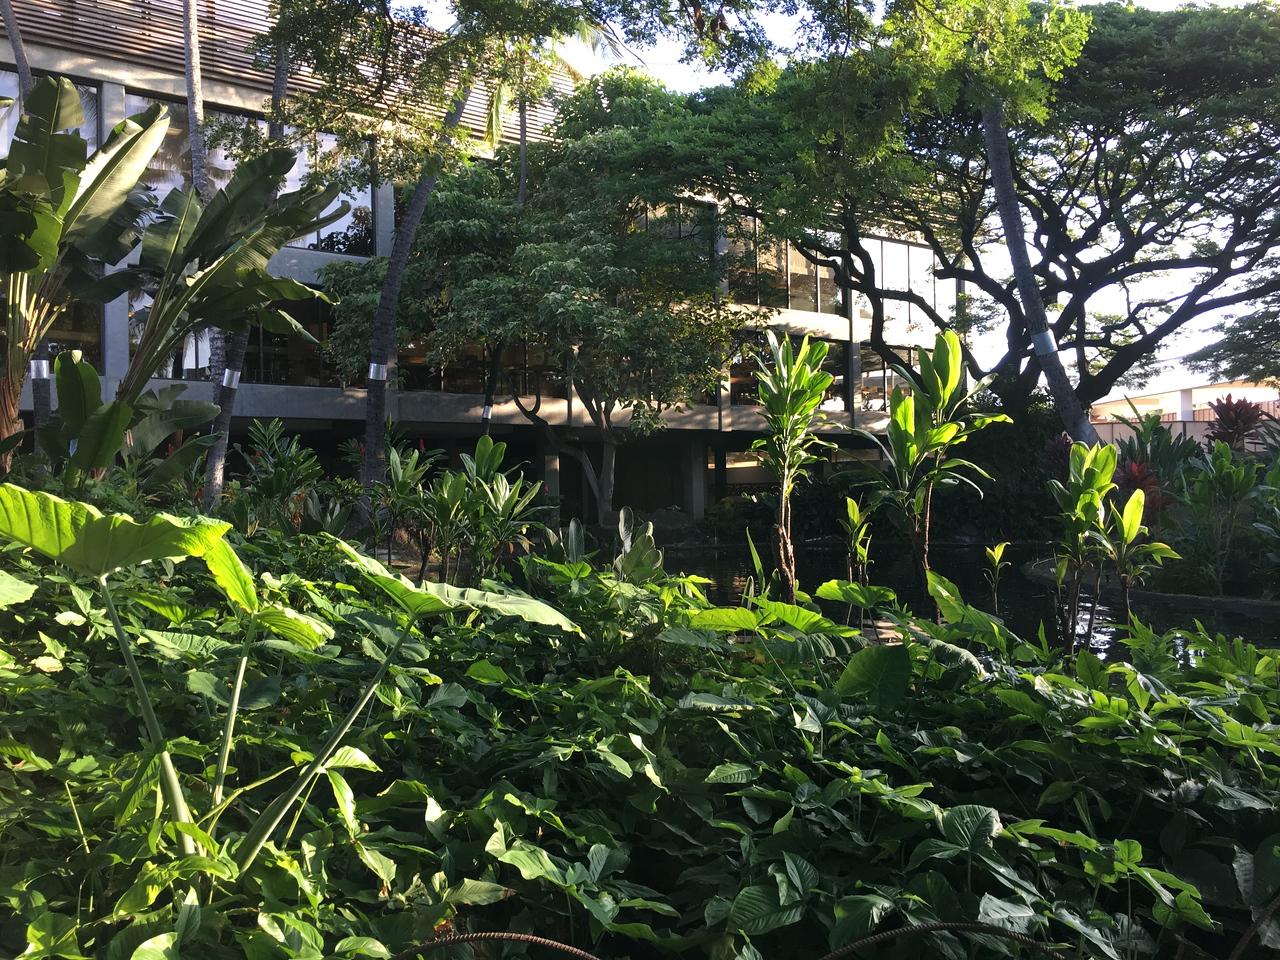 Hawaiian Culture Garden at the Honolulu airport